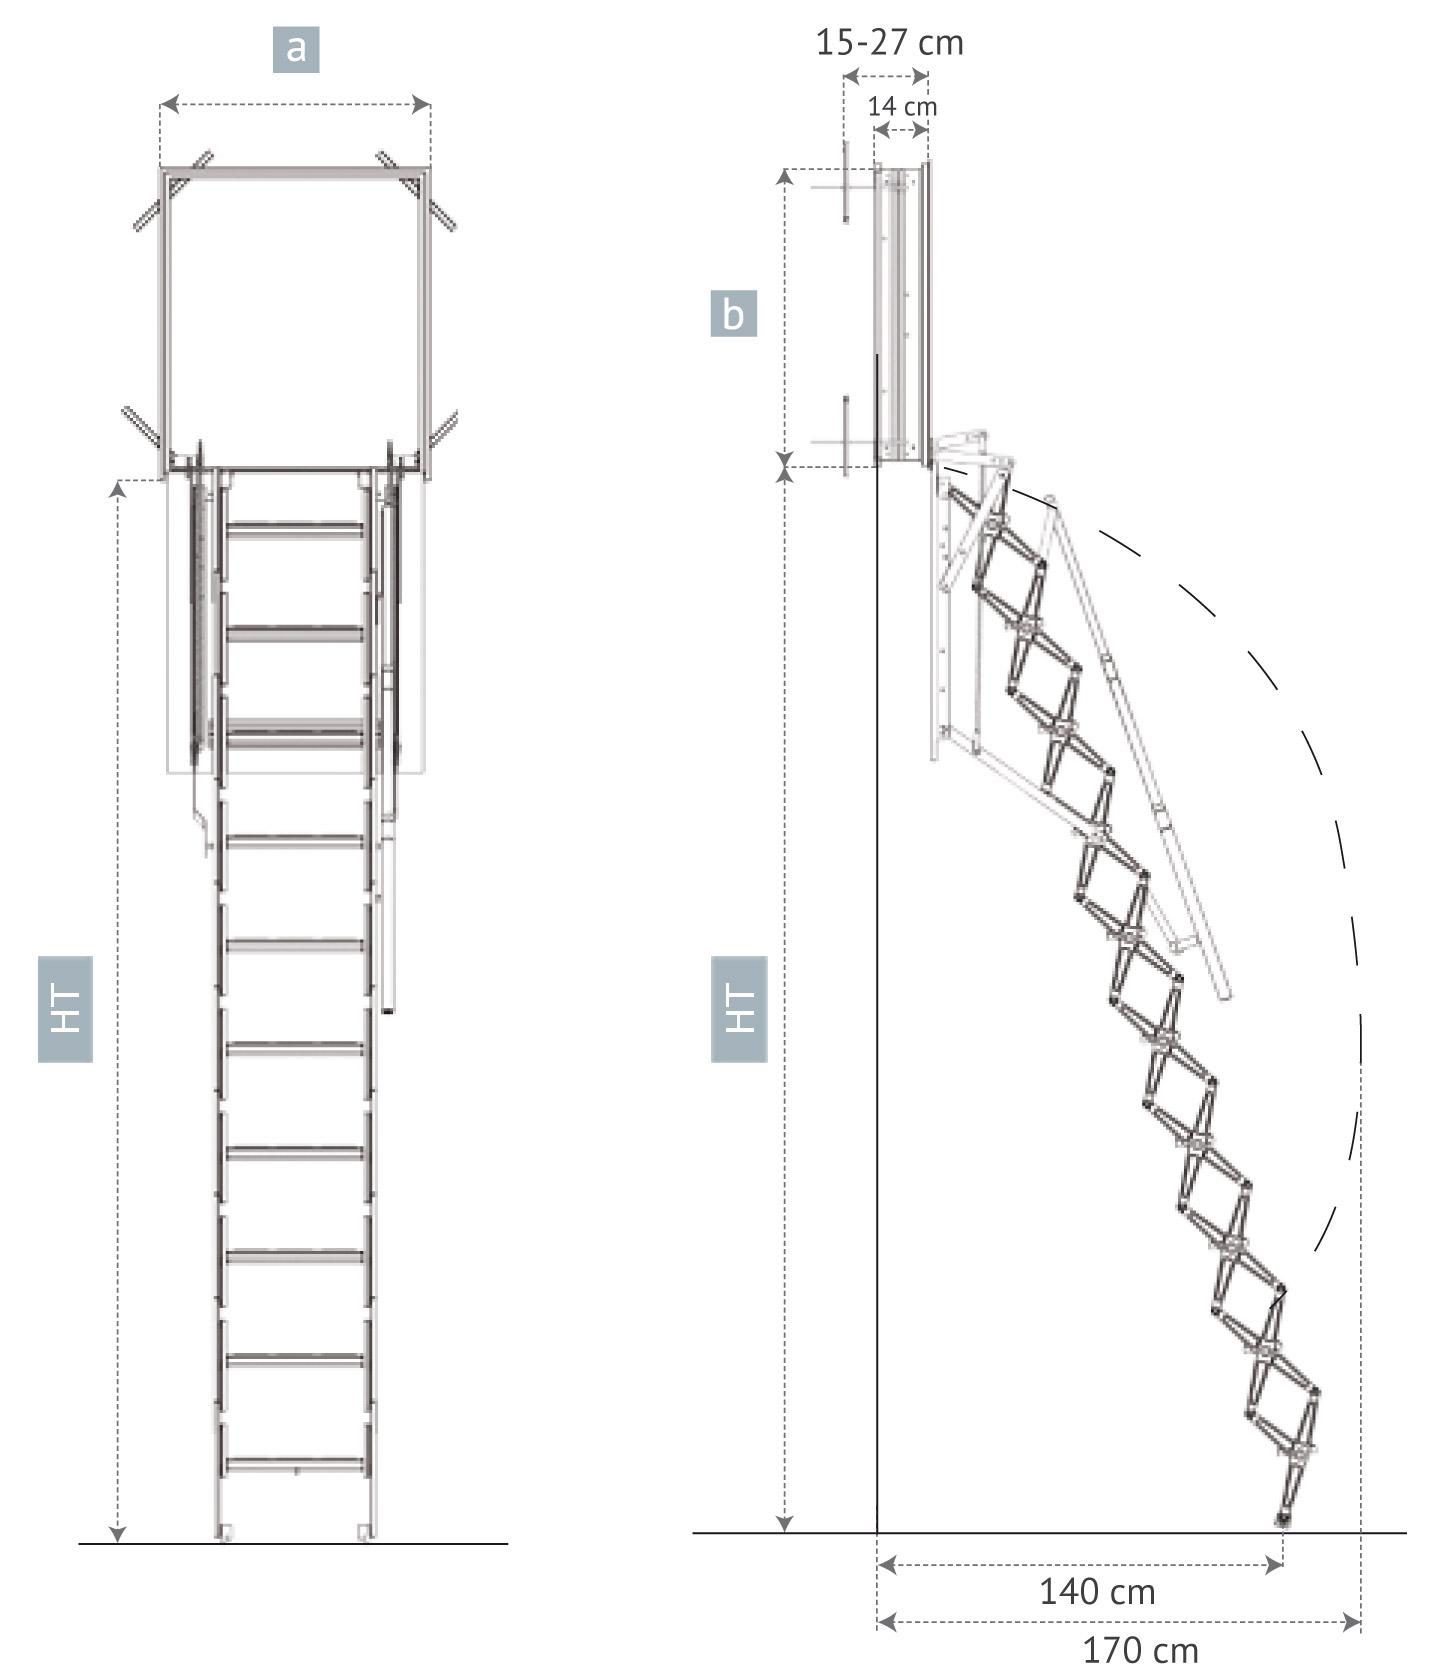 Escalera Escamoteable Para Pared Escalera Escamoteable Vertical ~ Dimensiones Escalera De Caracol